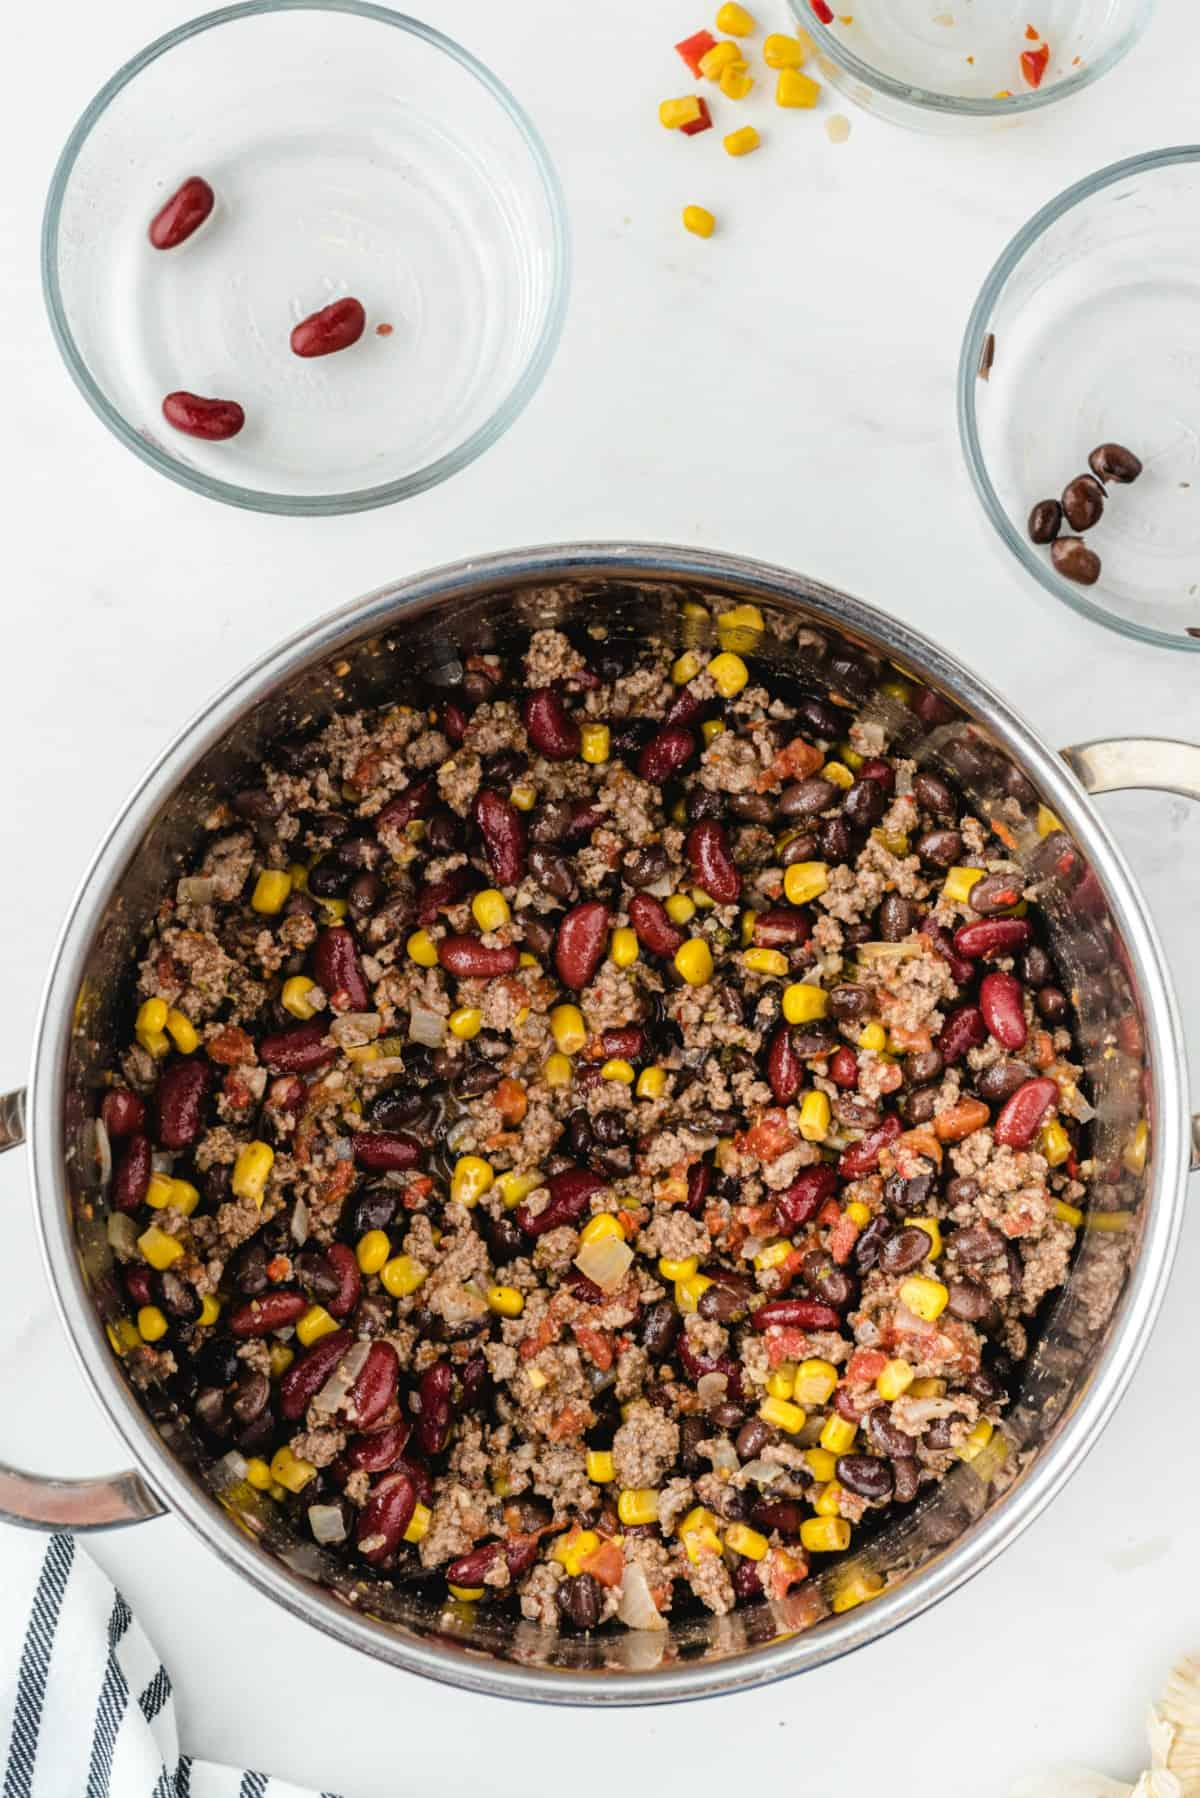 chili in a stock pot